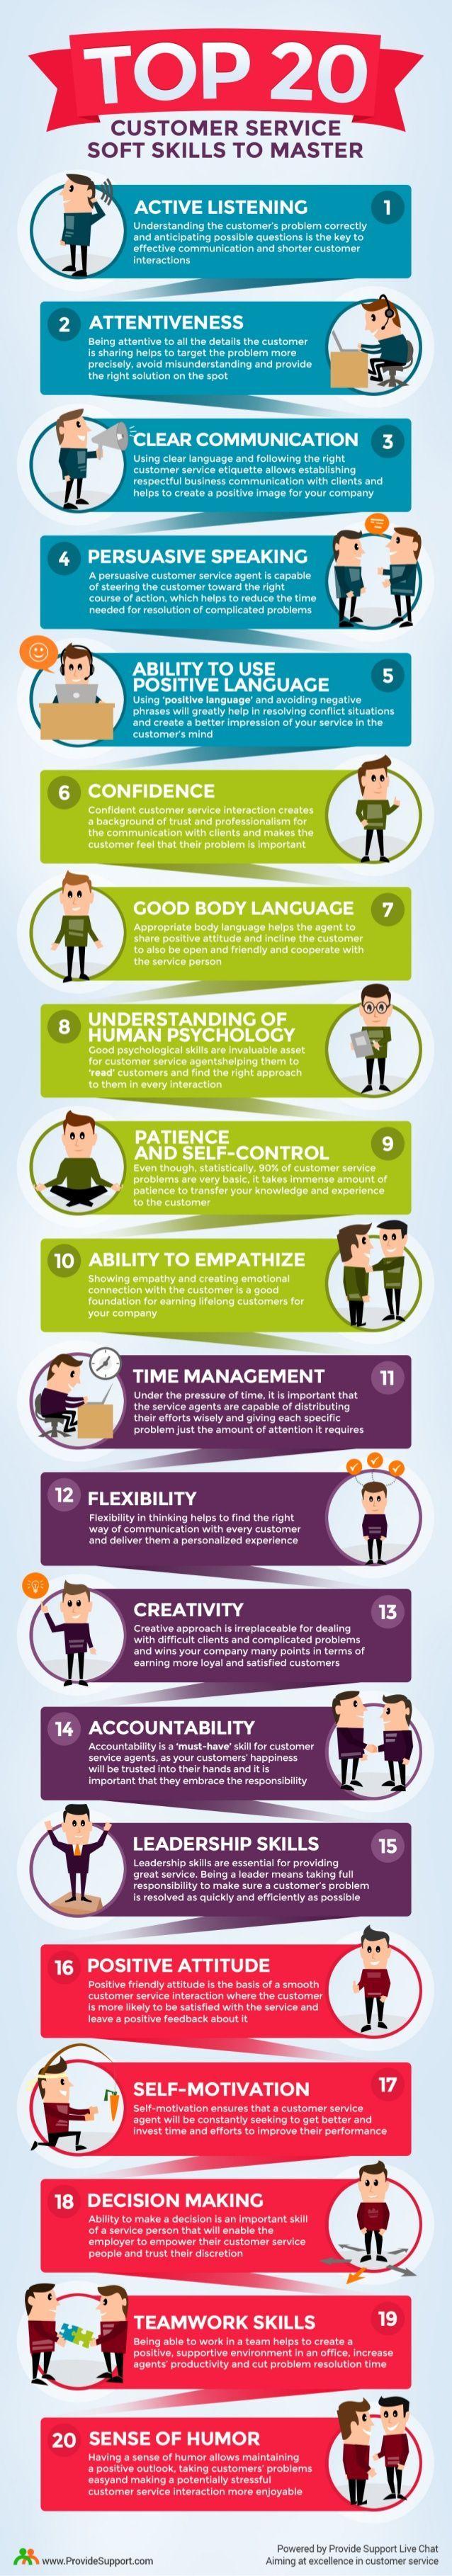 Customer Service Skills For A Positive Customer Experience Customer Service Training Customer Service Soft Skills